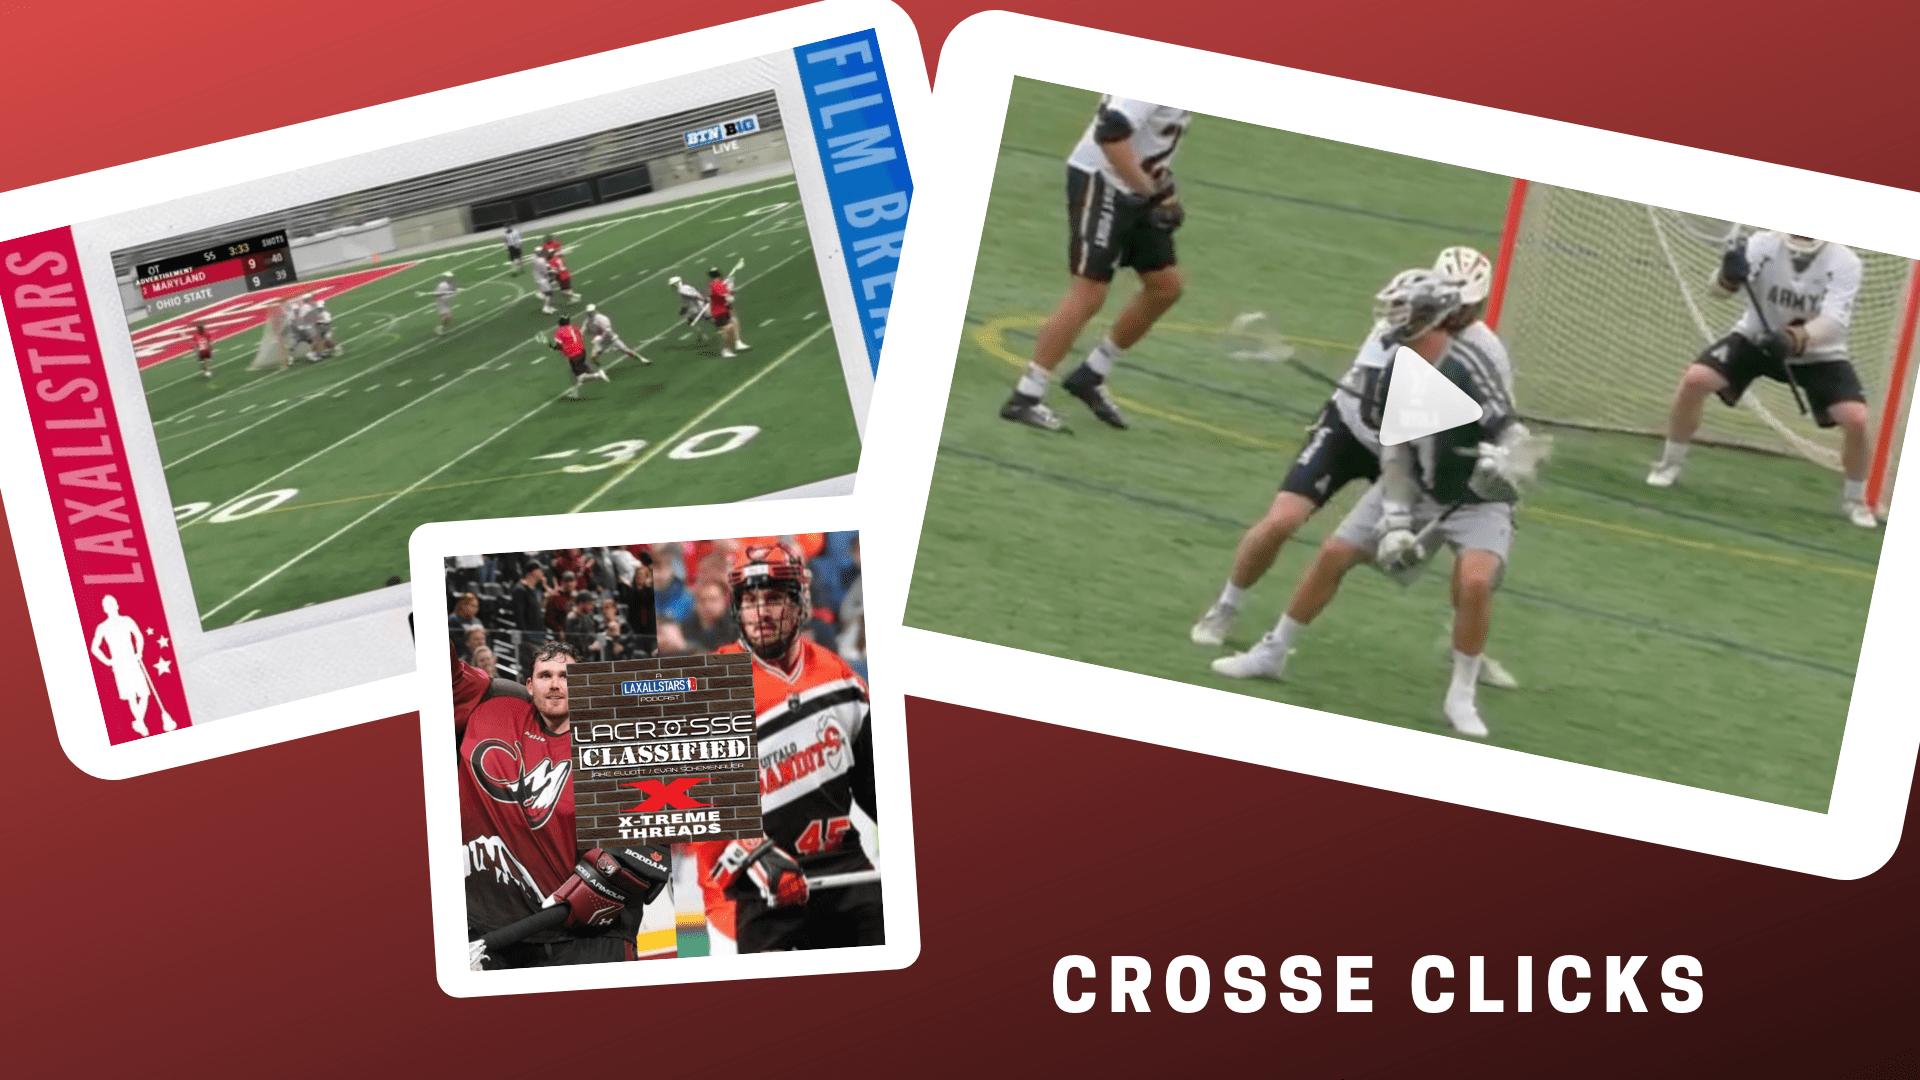 pat spencer jared bernhardt lacrosse classified crosse clicks